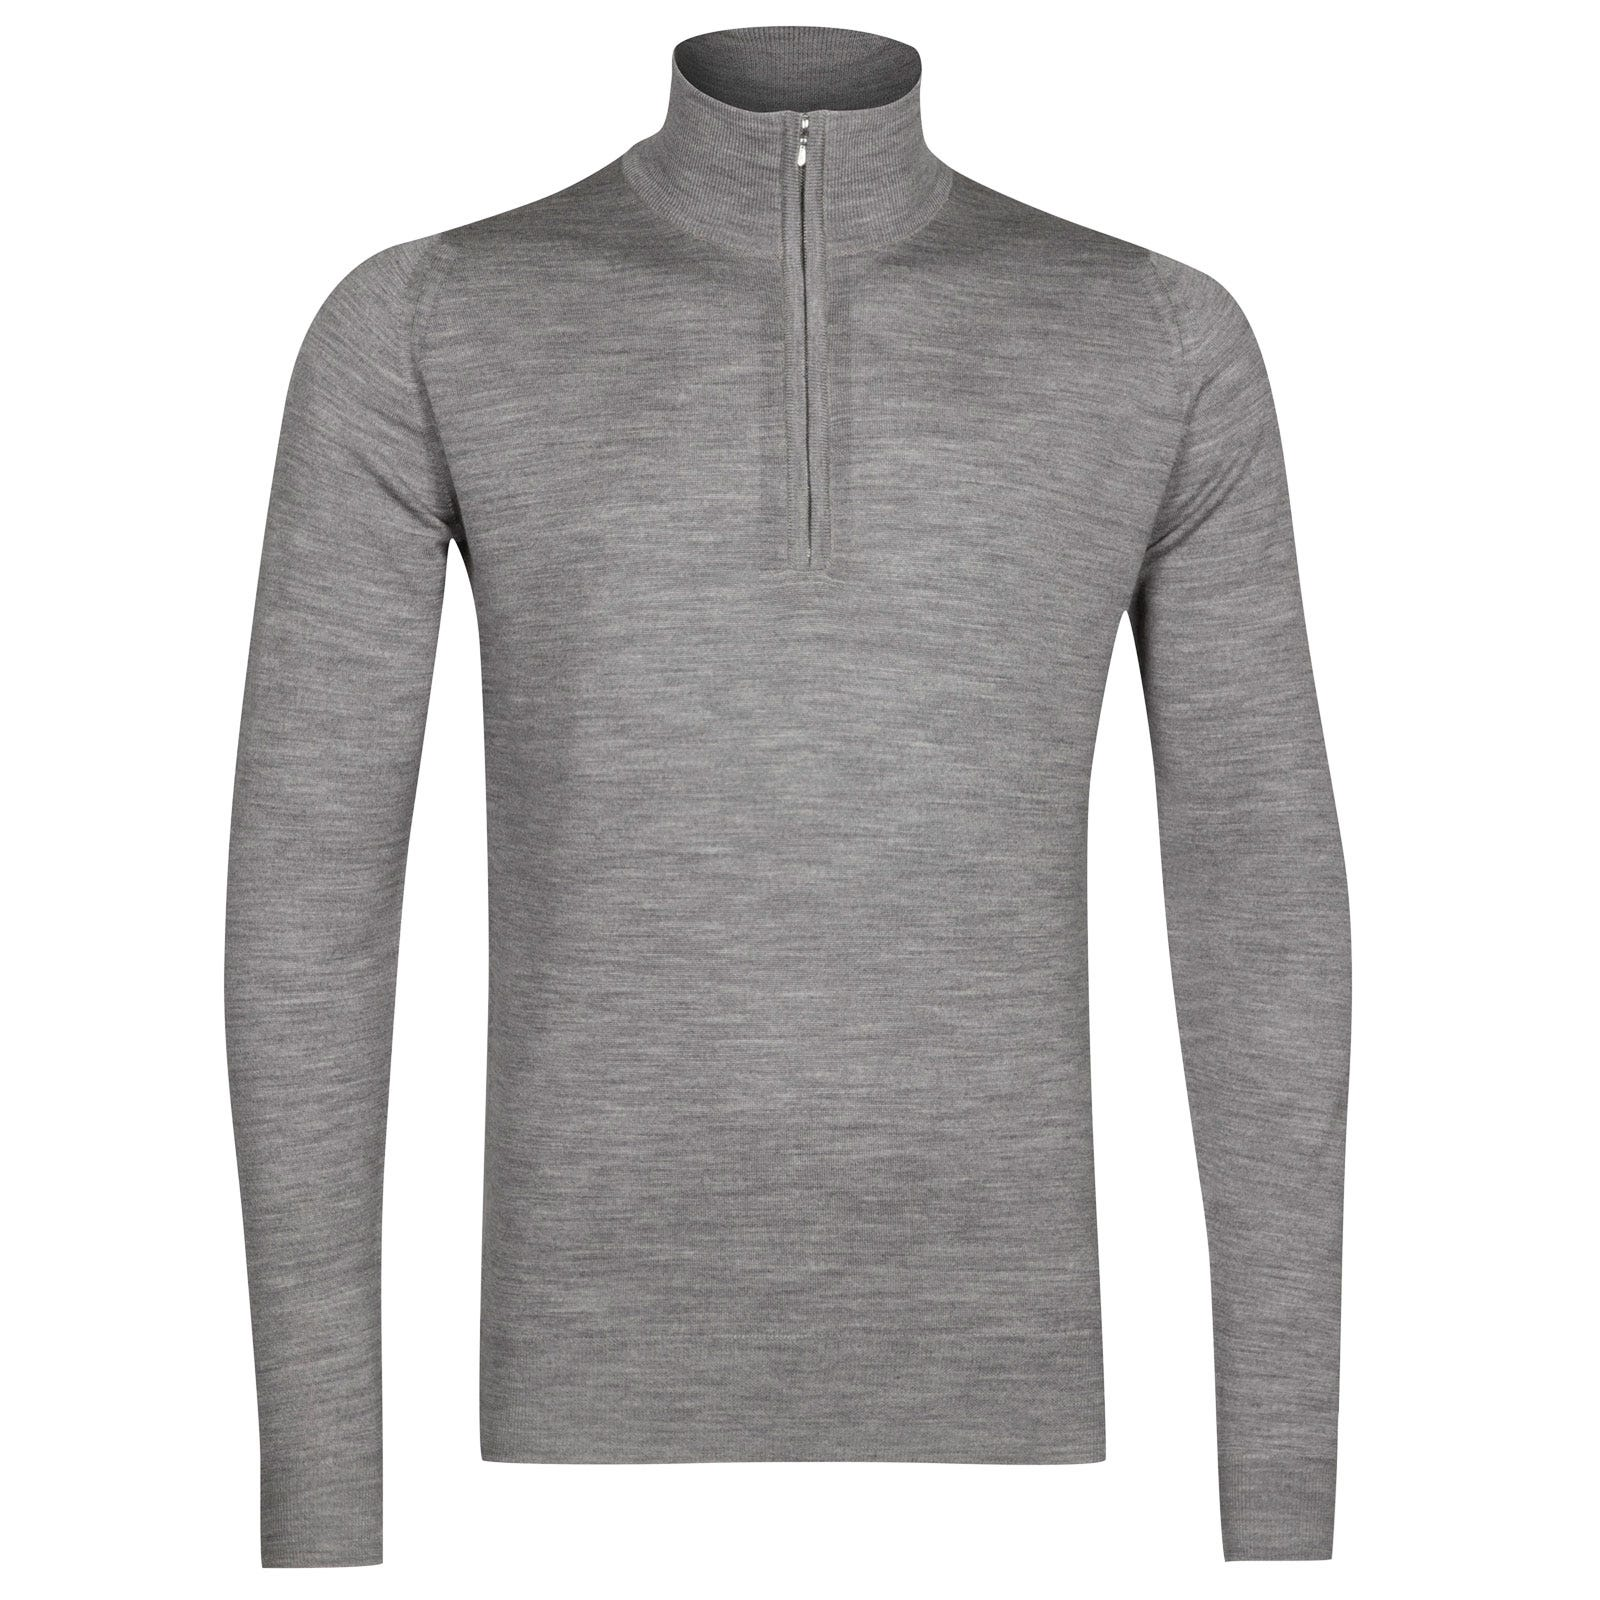 John Smedley Barrow Merino Wool Pullover in Silver-XXL